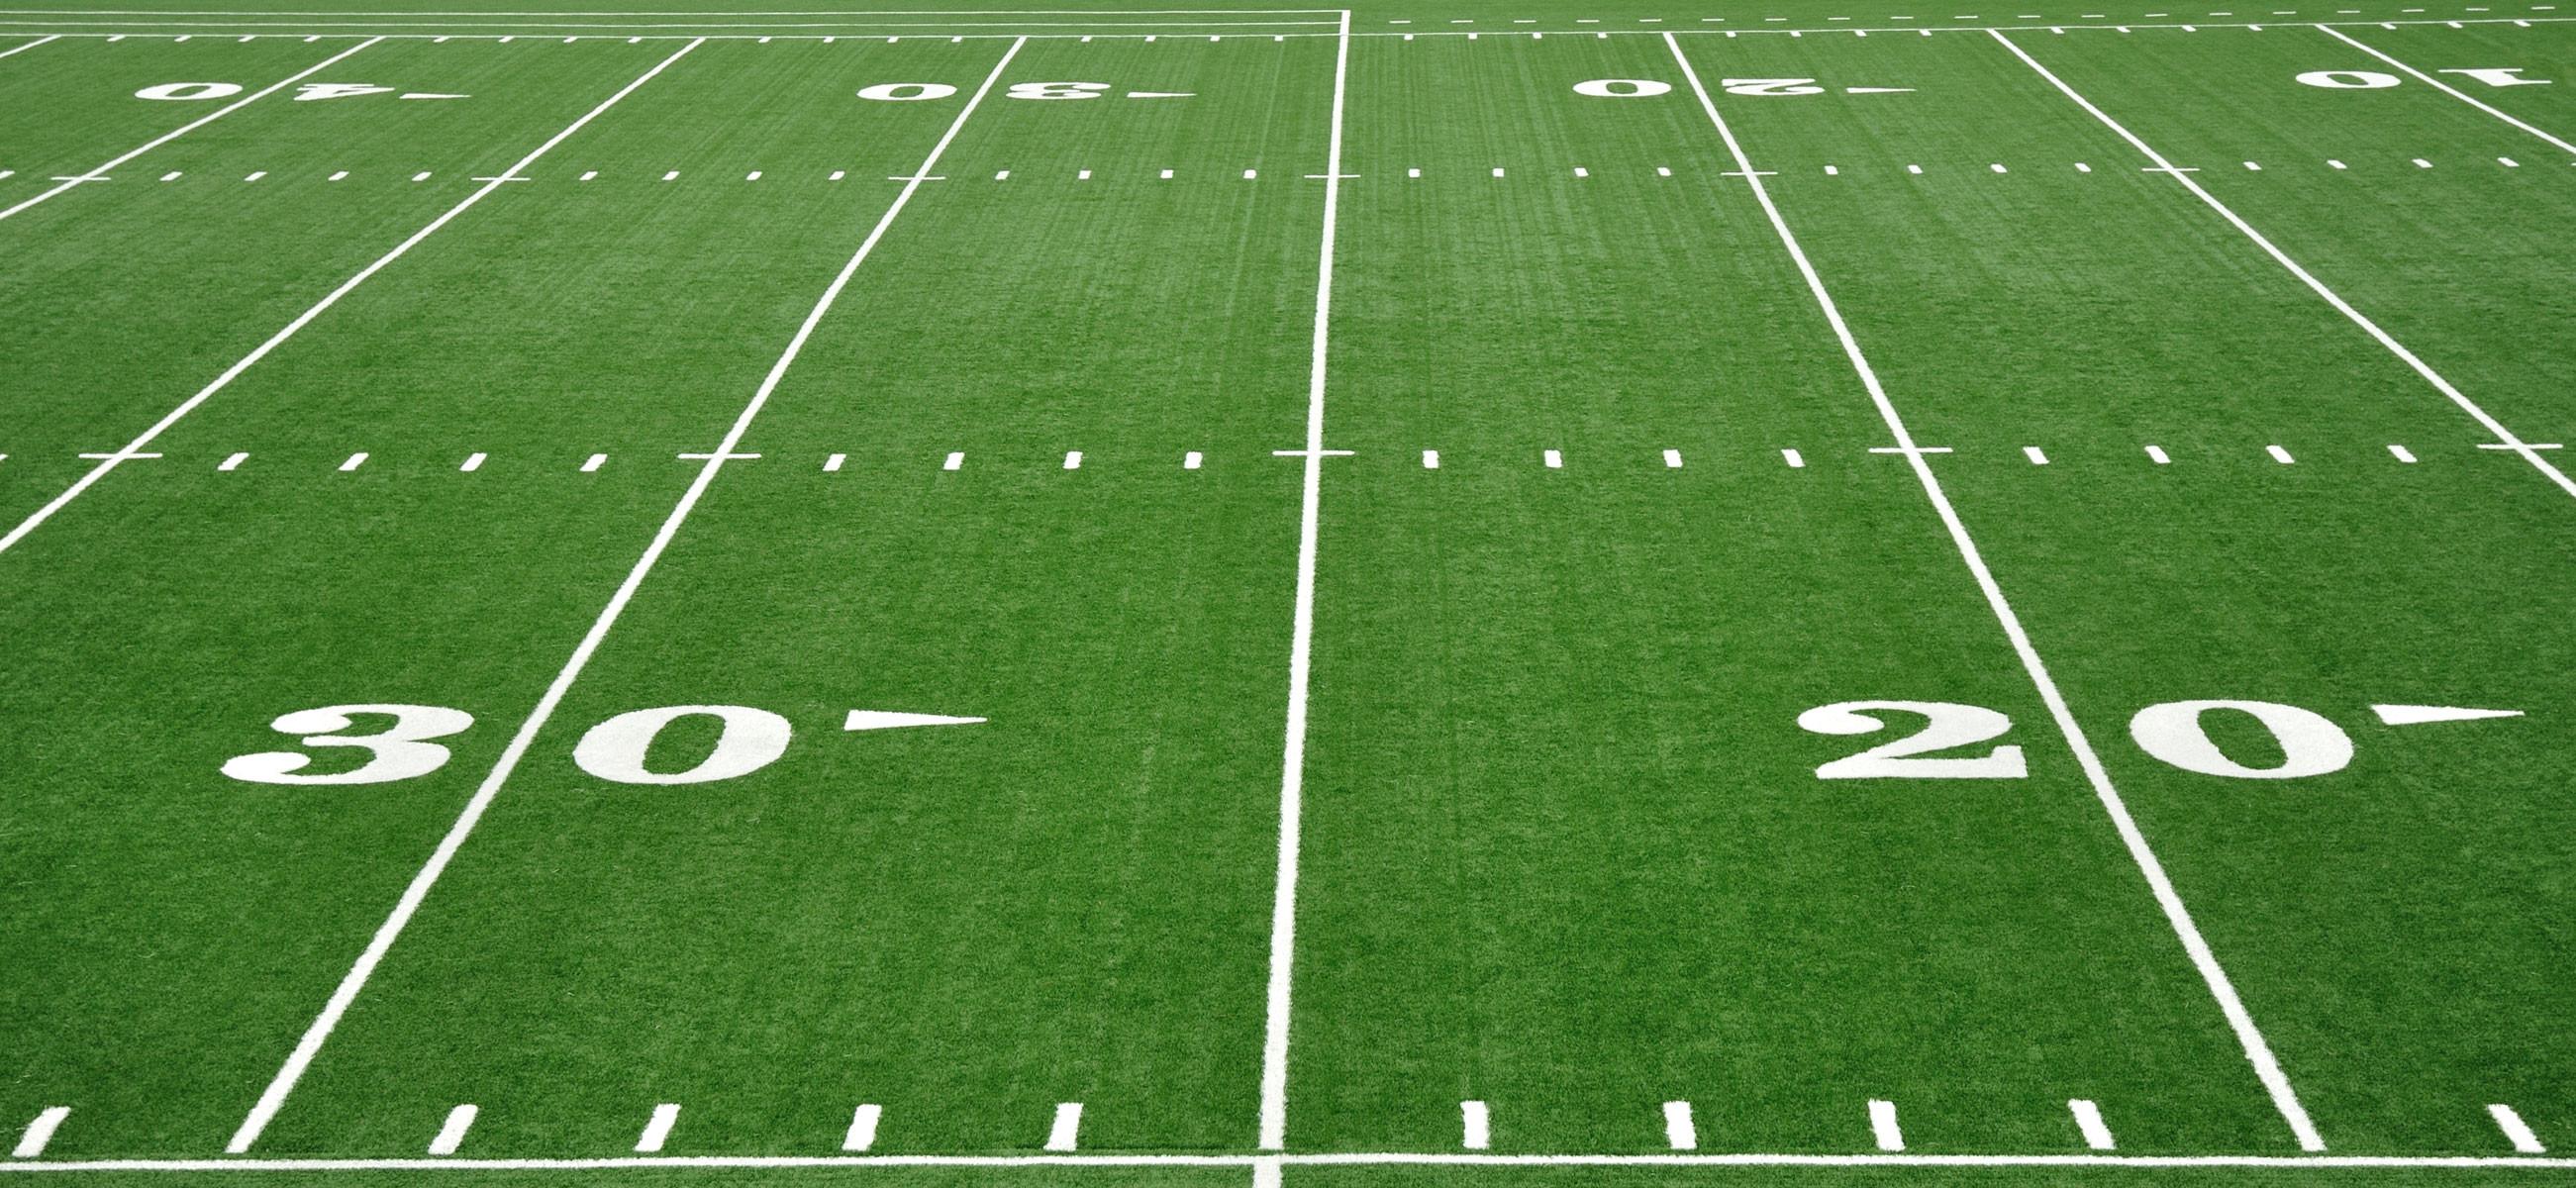 Best Photos of Football Field Background Football Field Lines, UEFA #10023